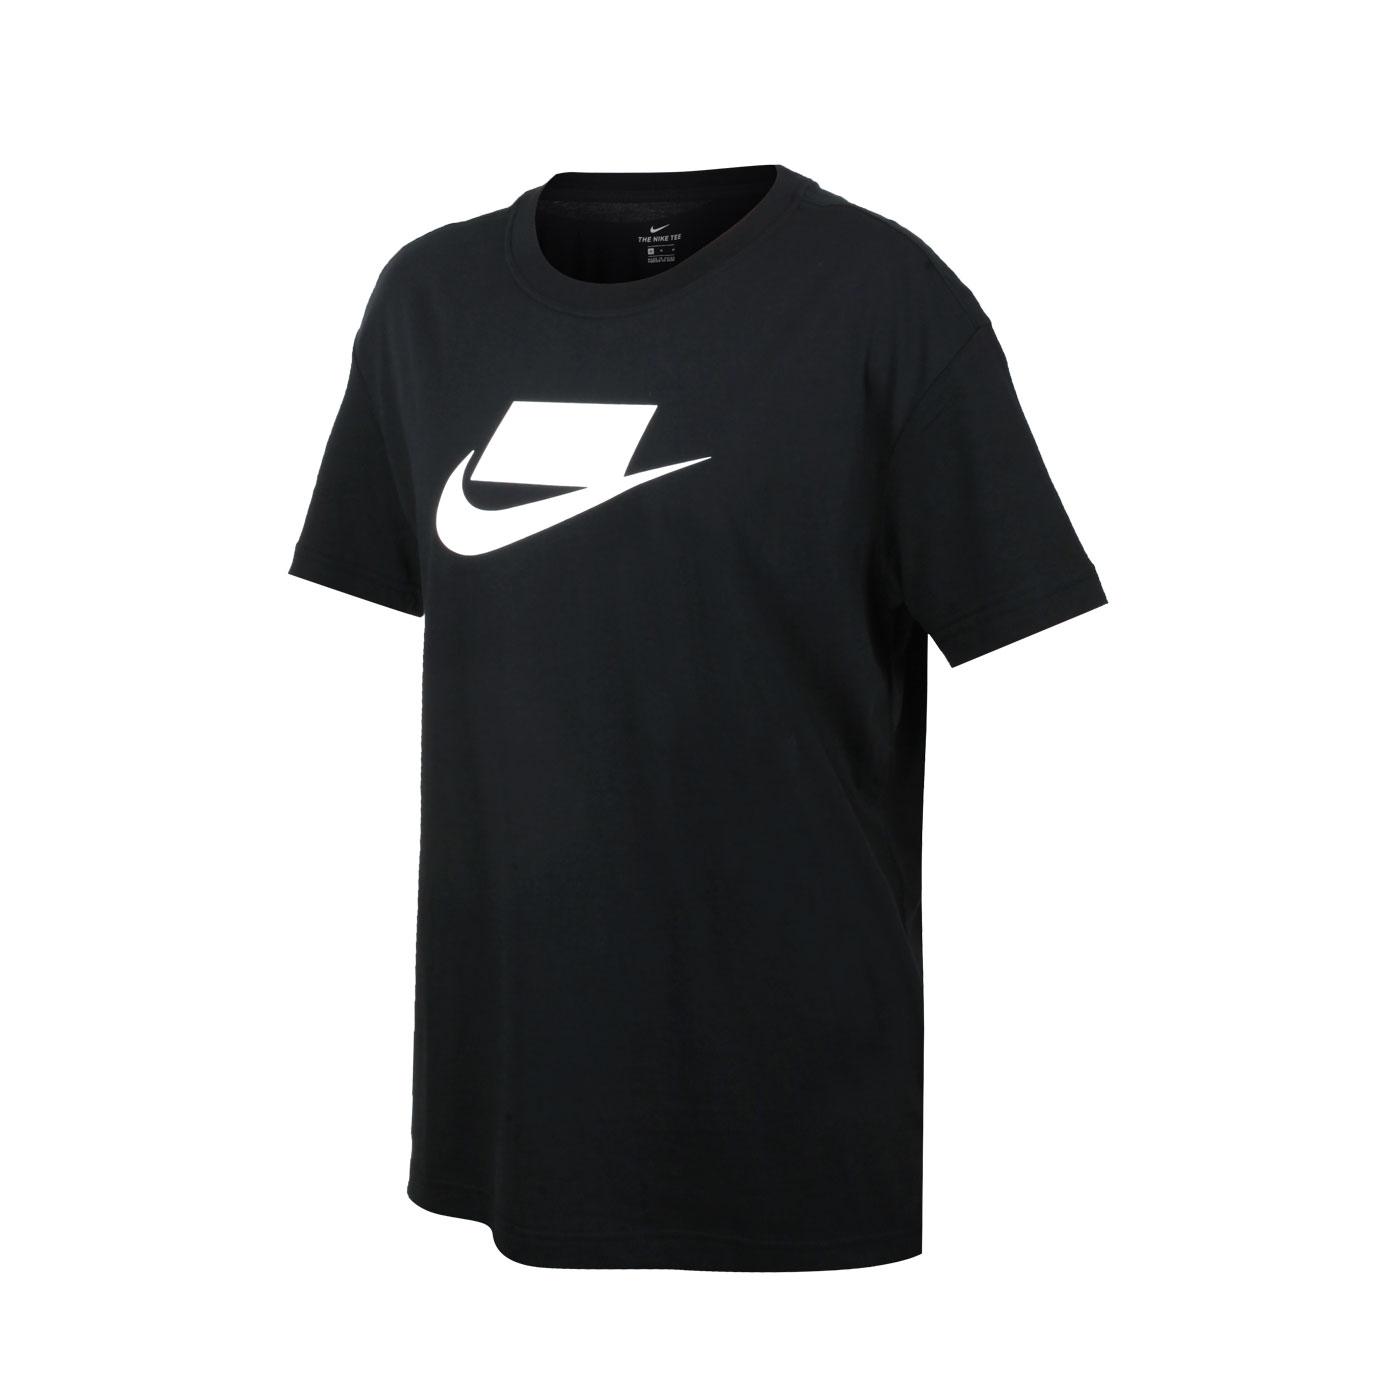 NIKE 女款短袖T恤 DB9828-010 - 黑白